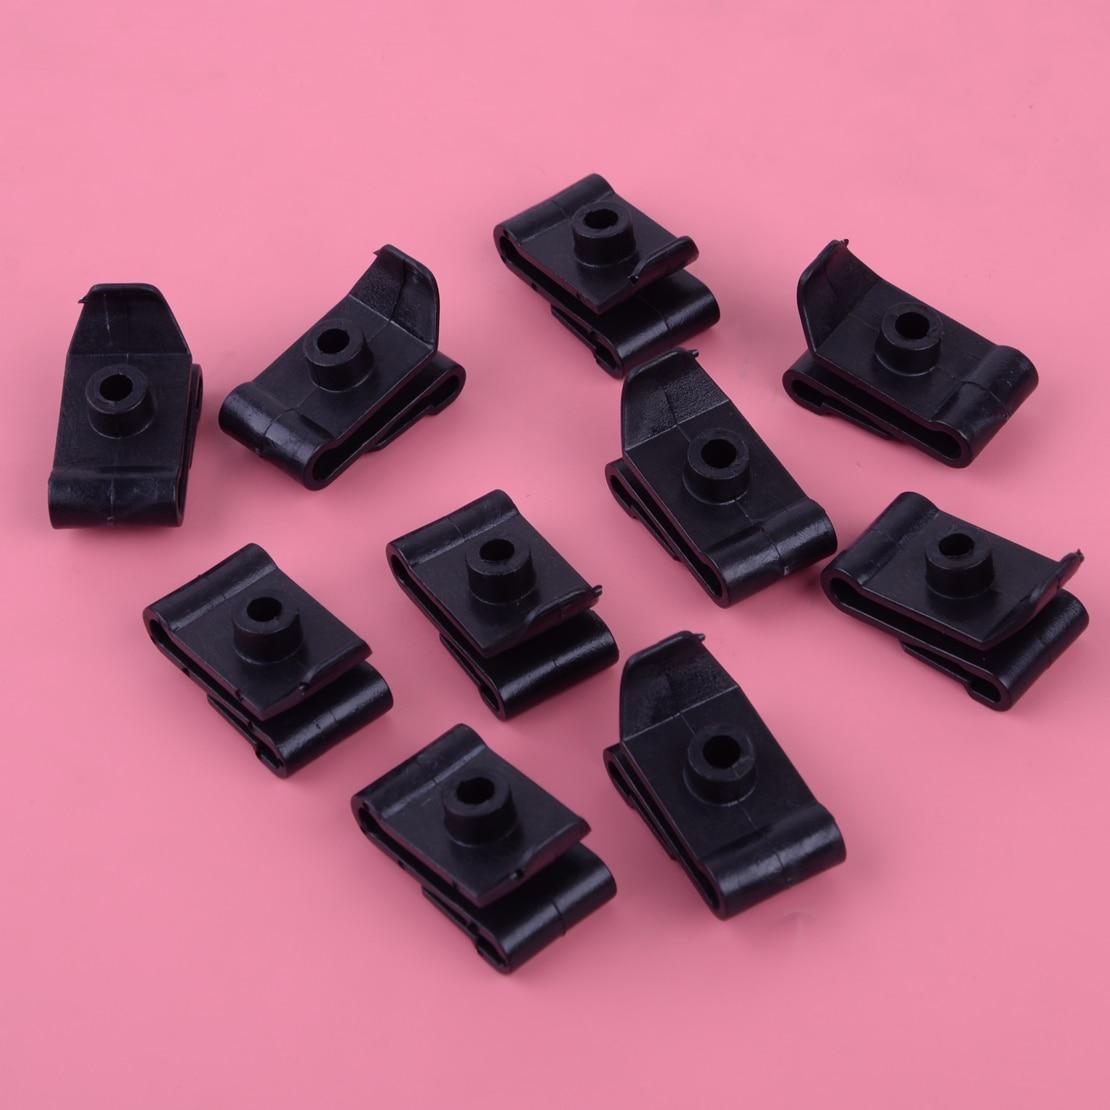 Black Car Front Fender /& Bumper Cover Clips Kit For Toyota Camry Corolla Lexus Z